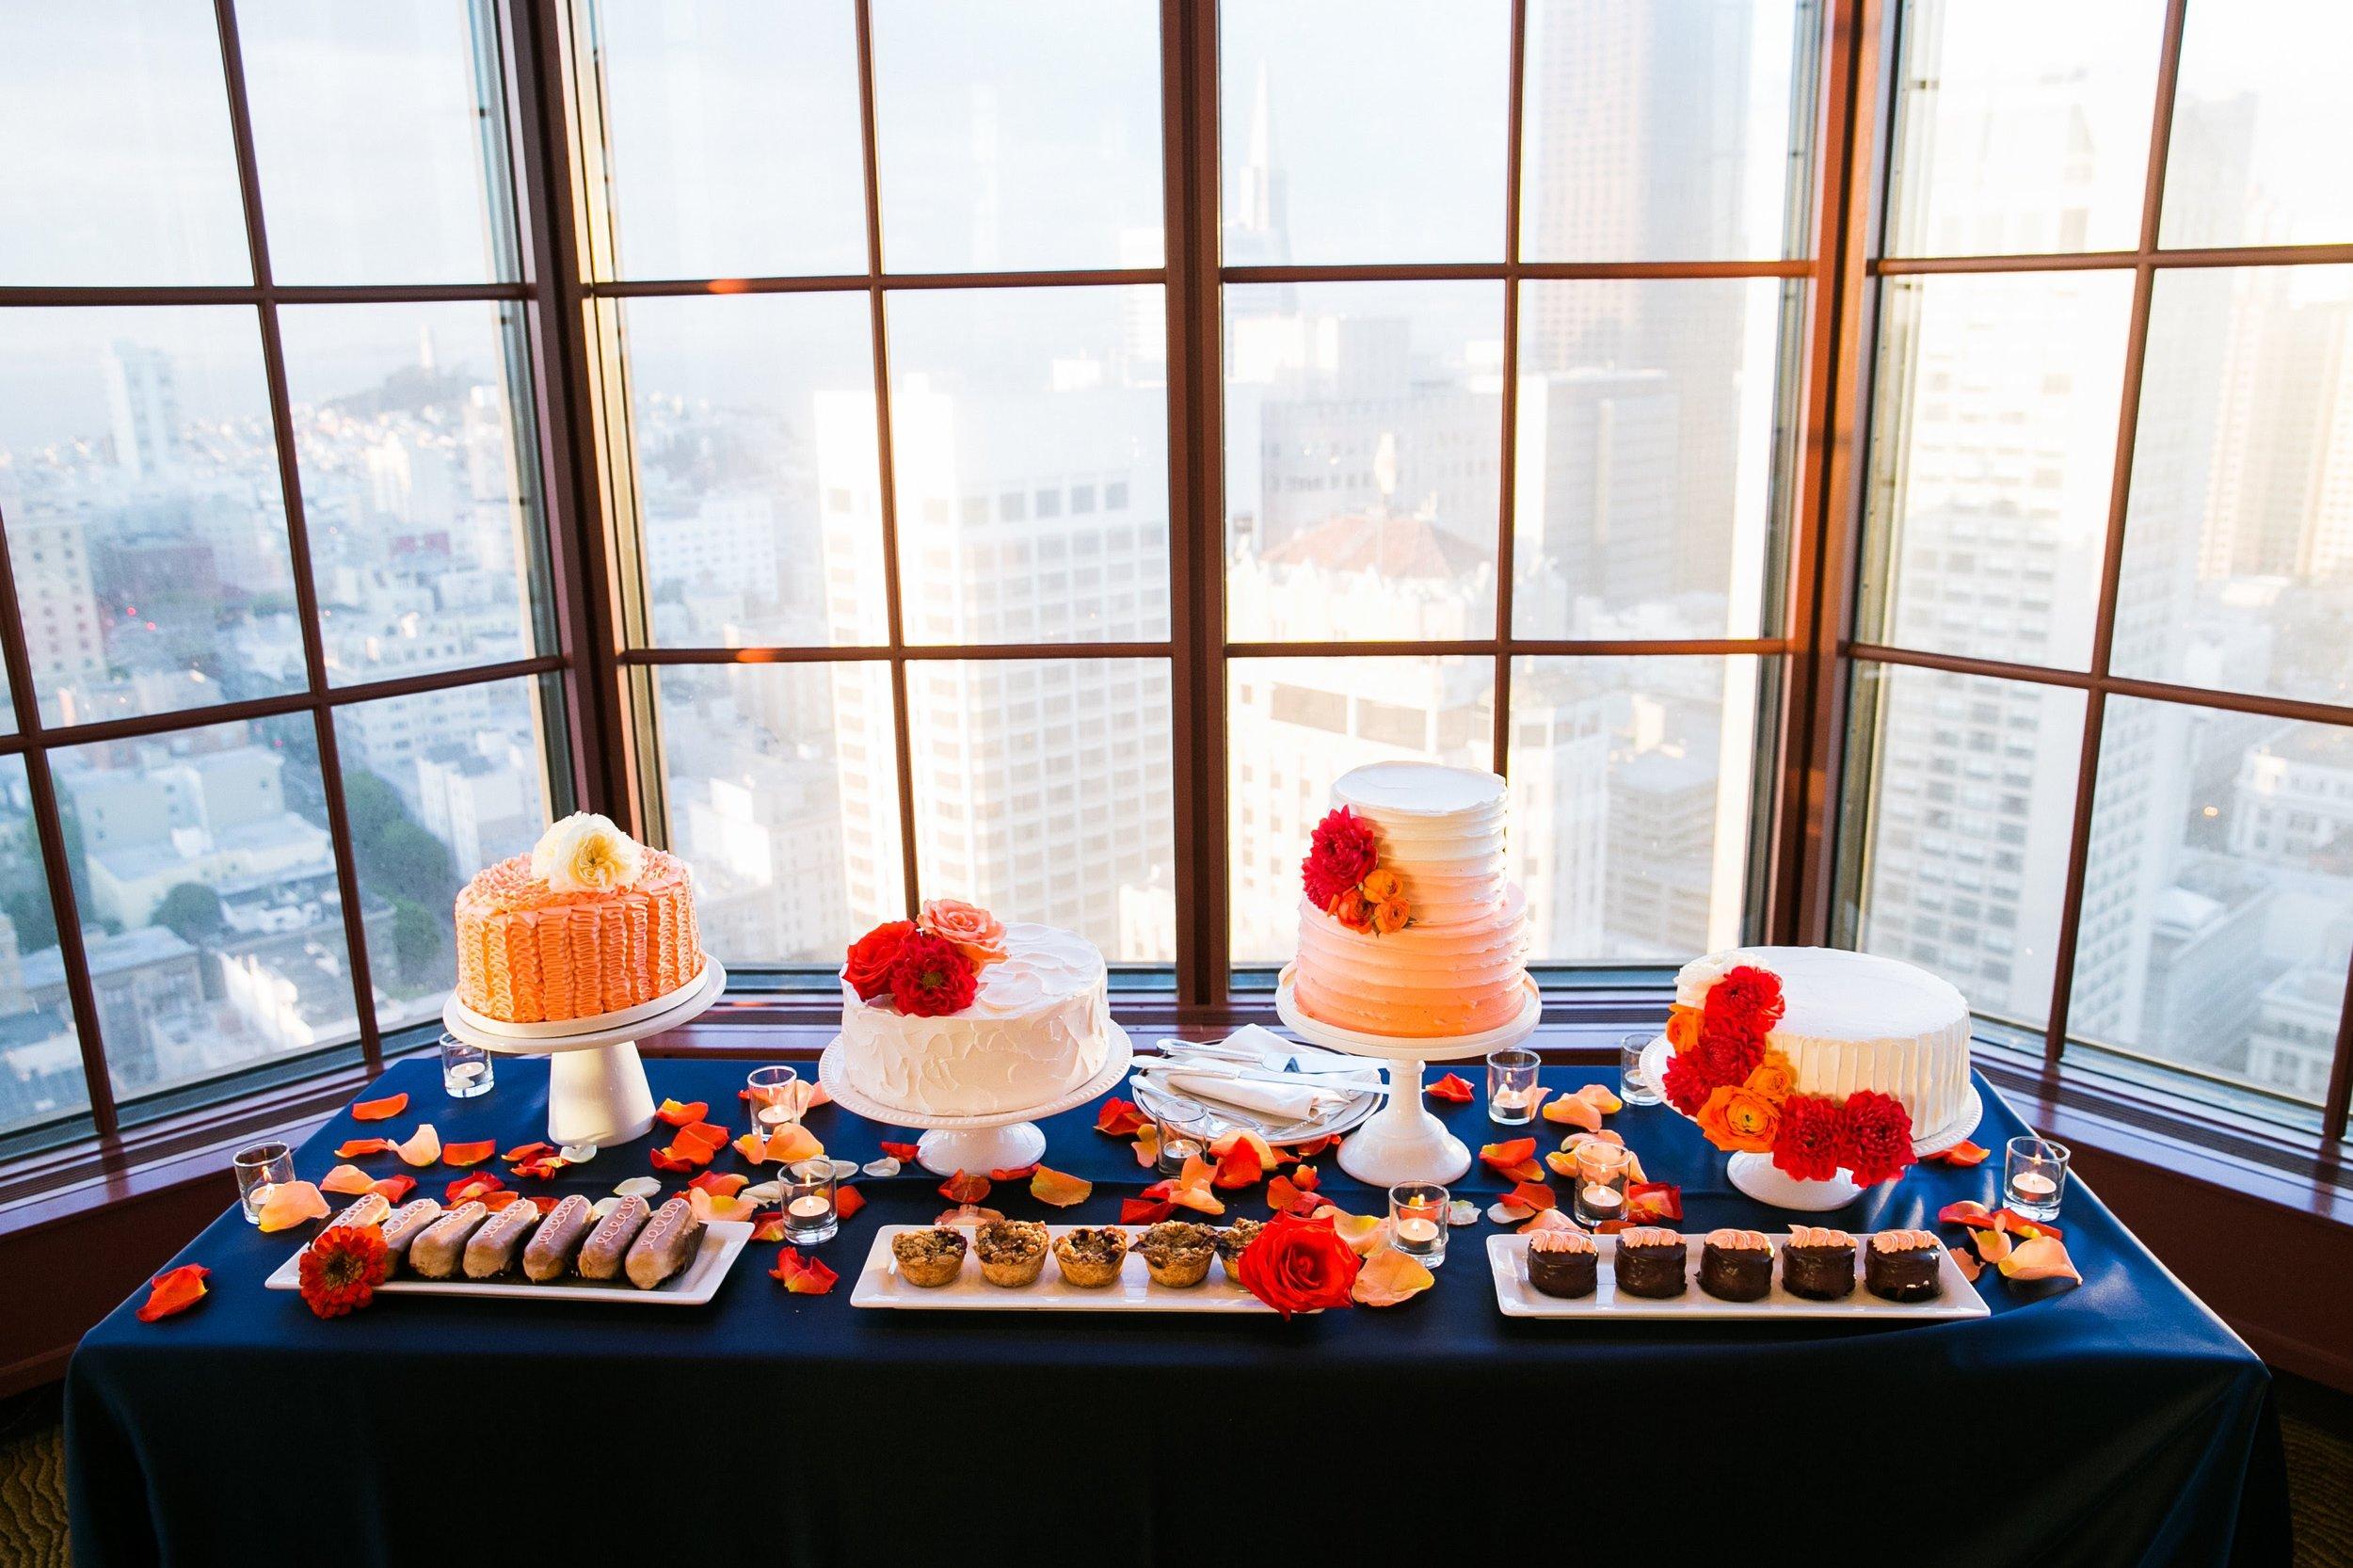 dessert-bar11.jpg